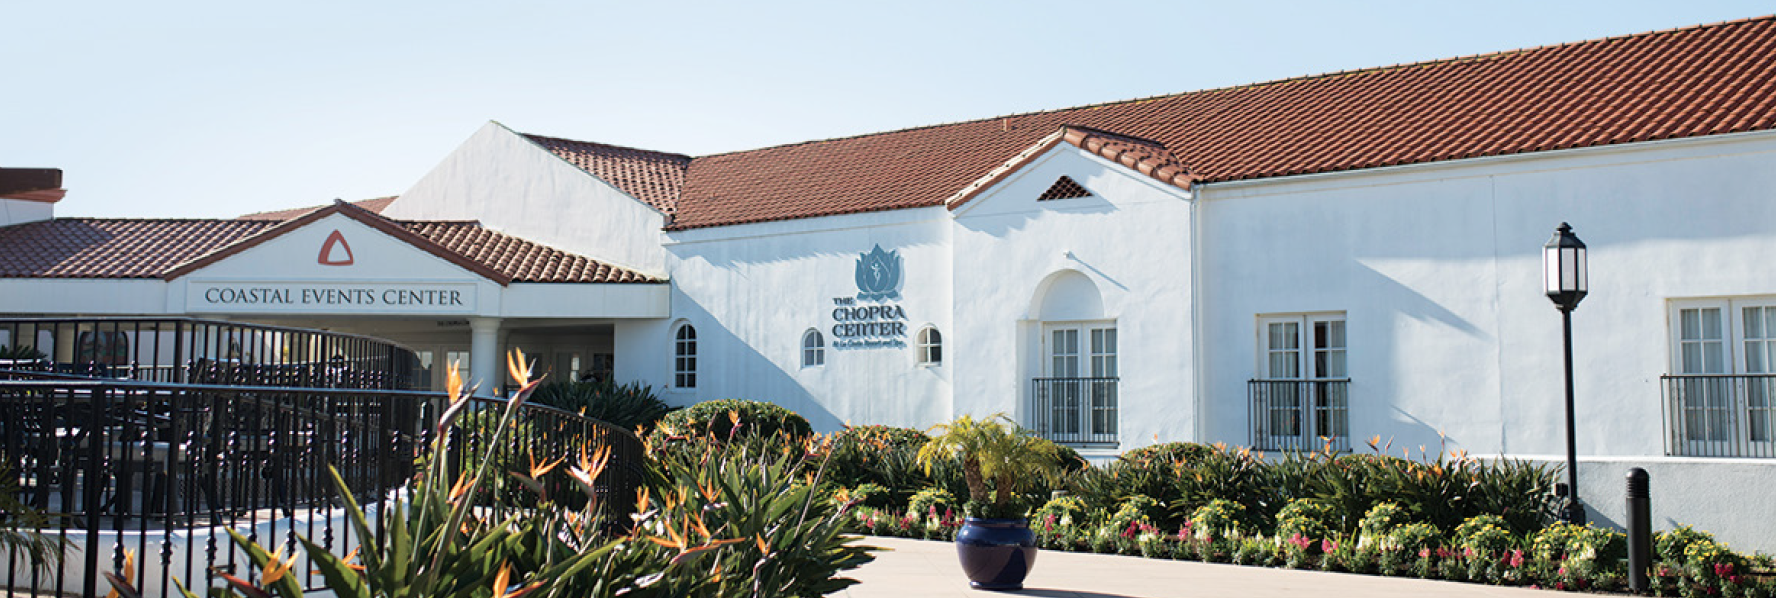 Chopra Center Carlsbad California